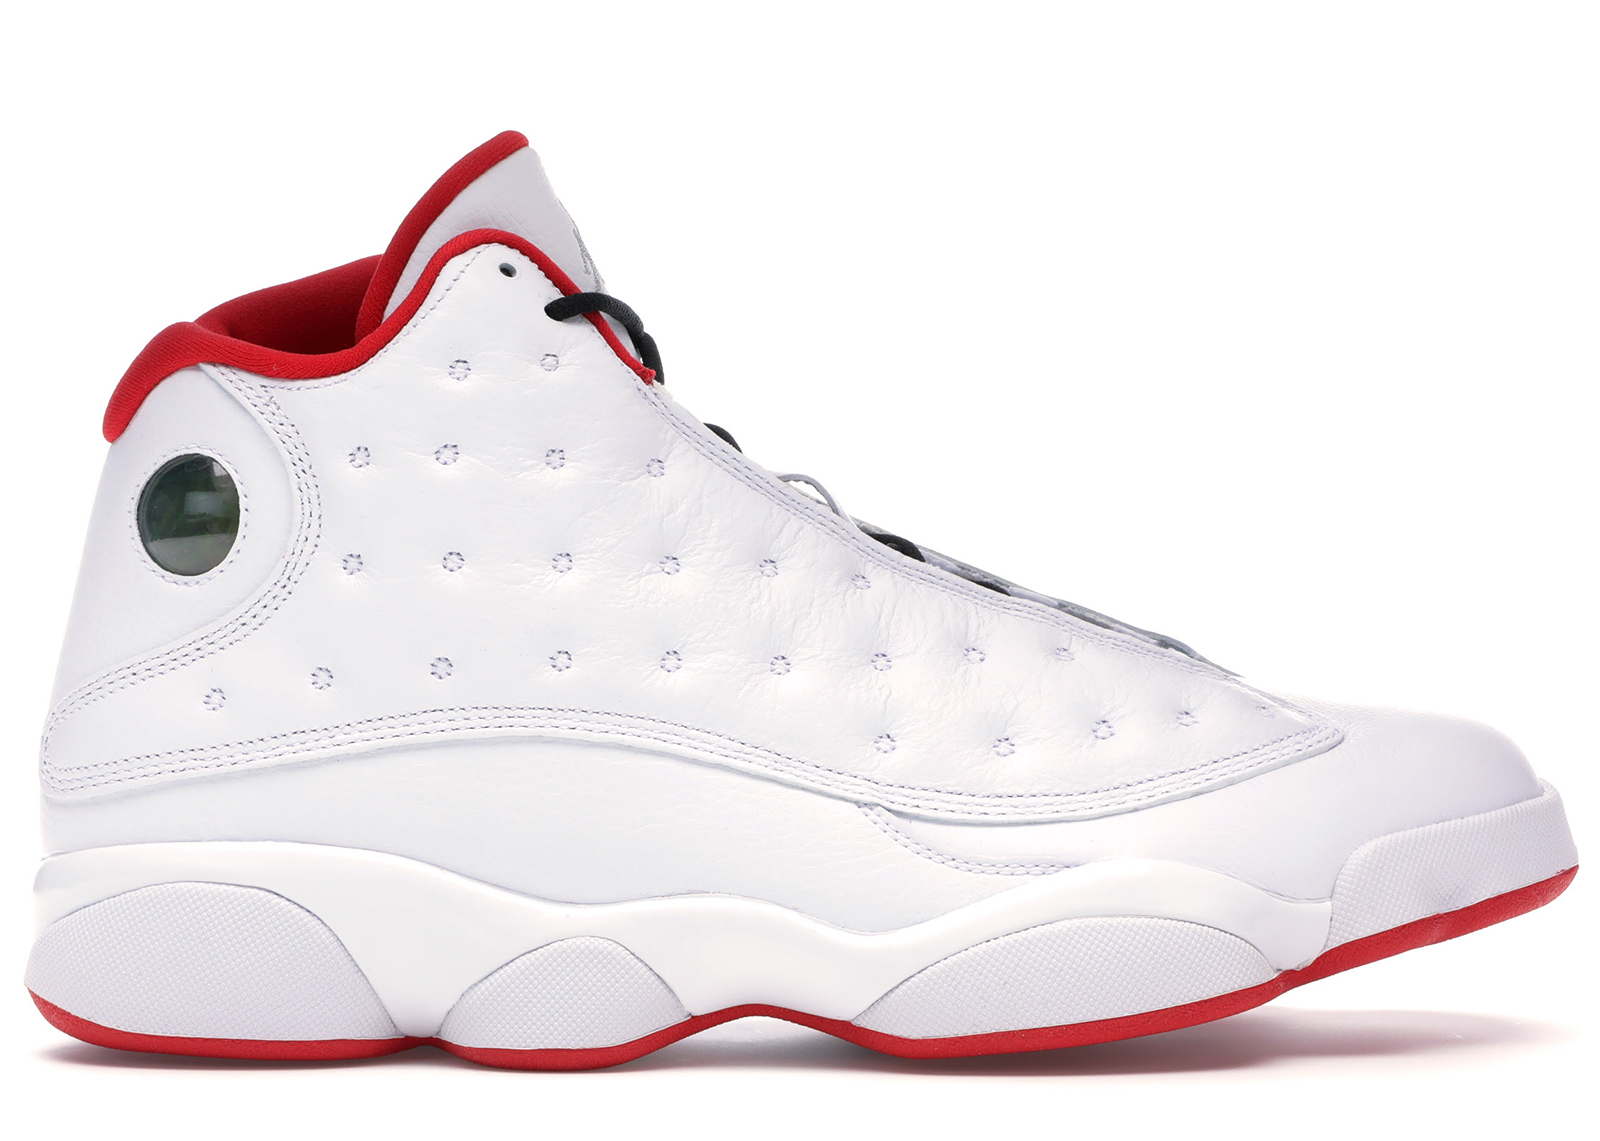 Buy Air Jordan 13 Shoes & Deadstock Sneakers